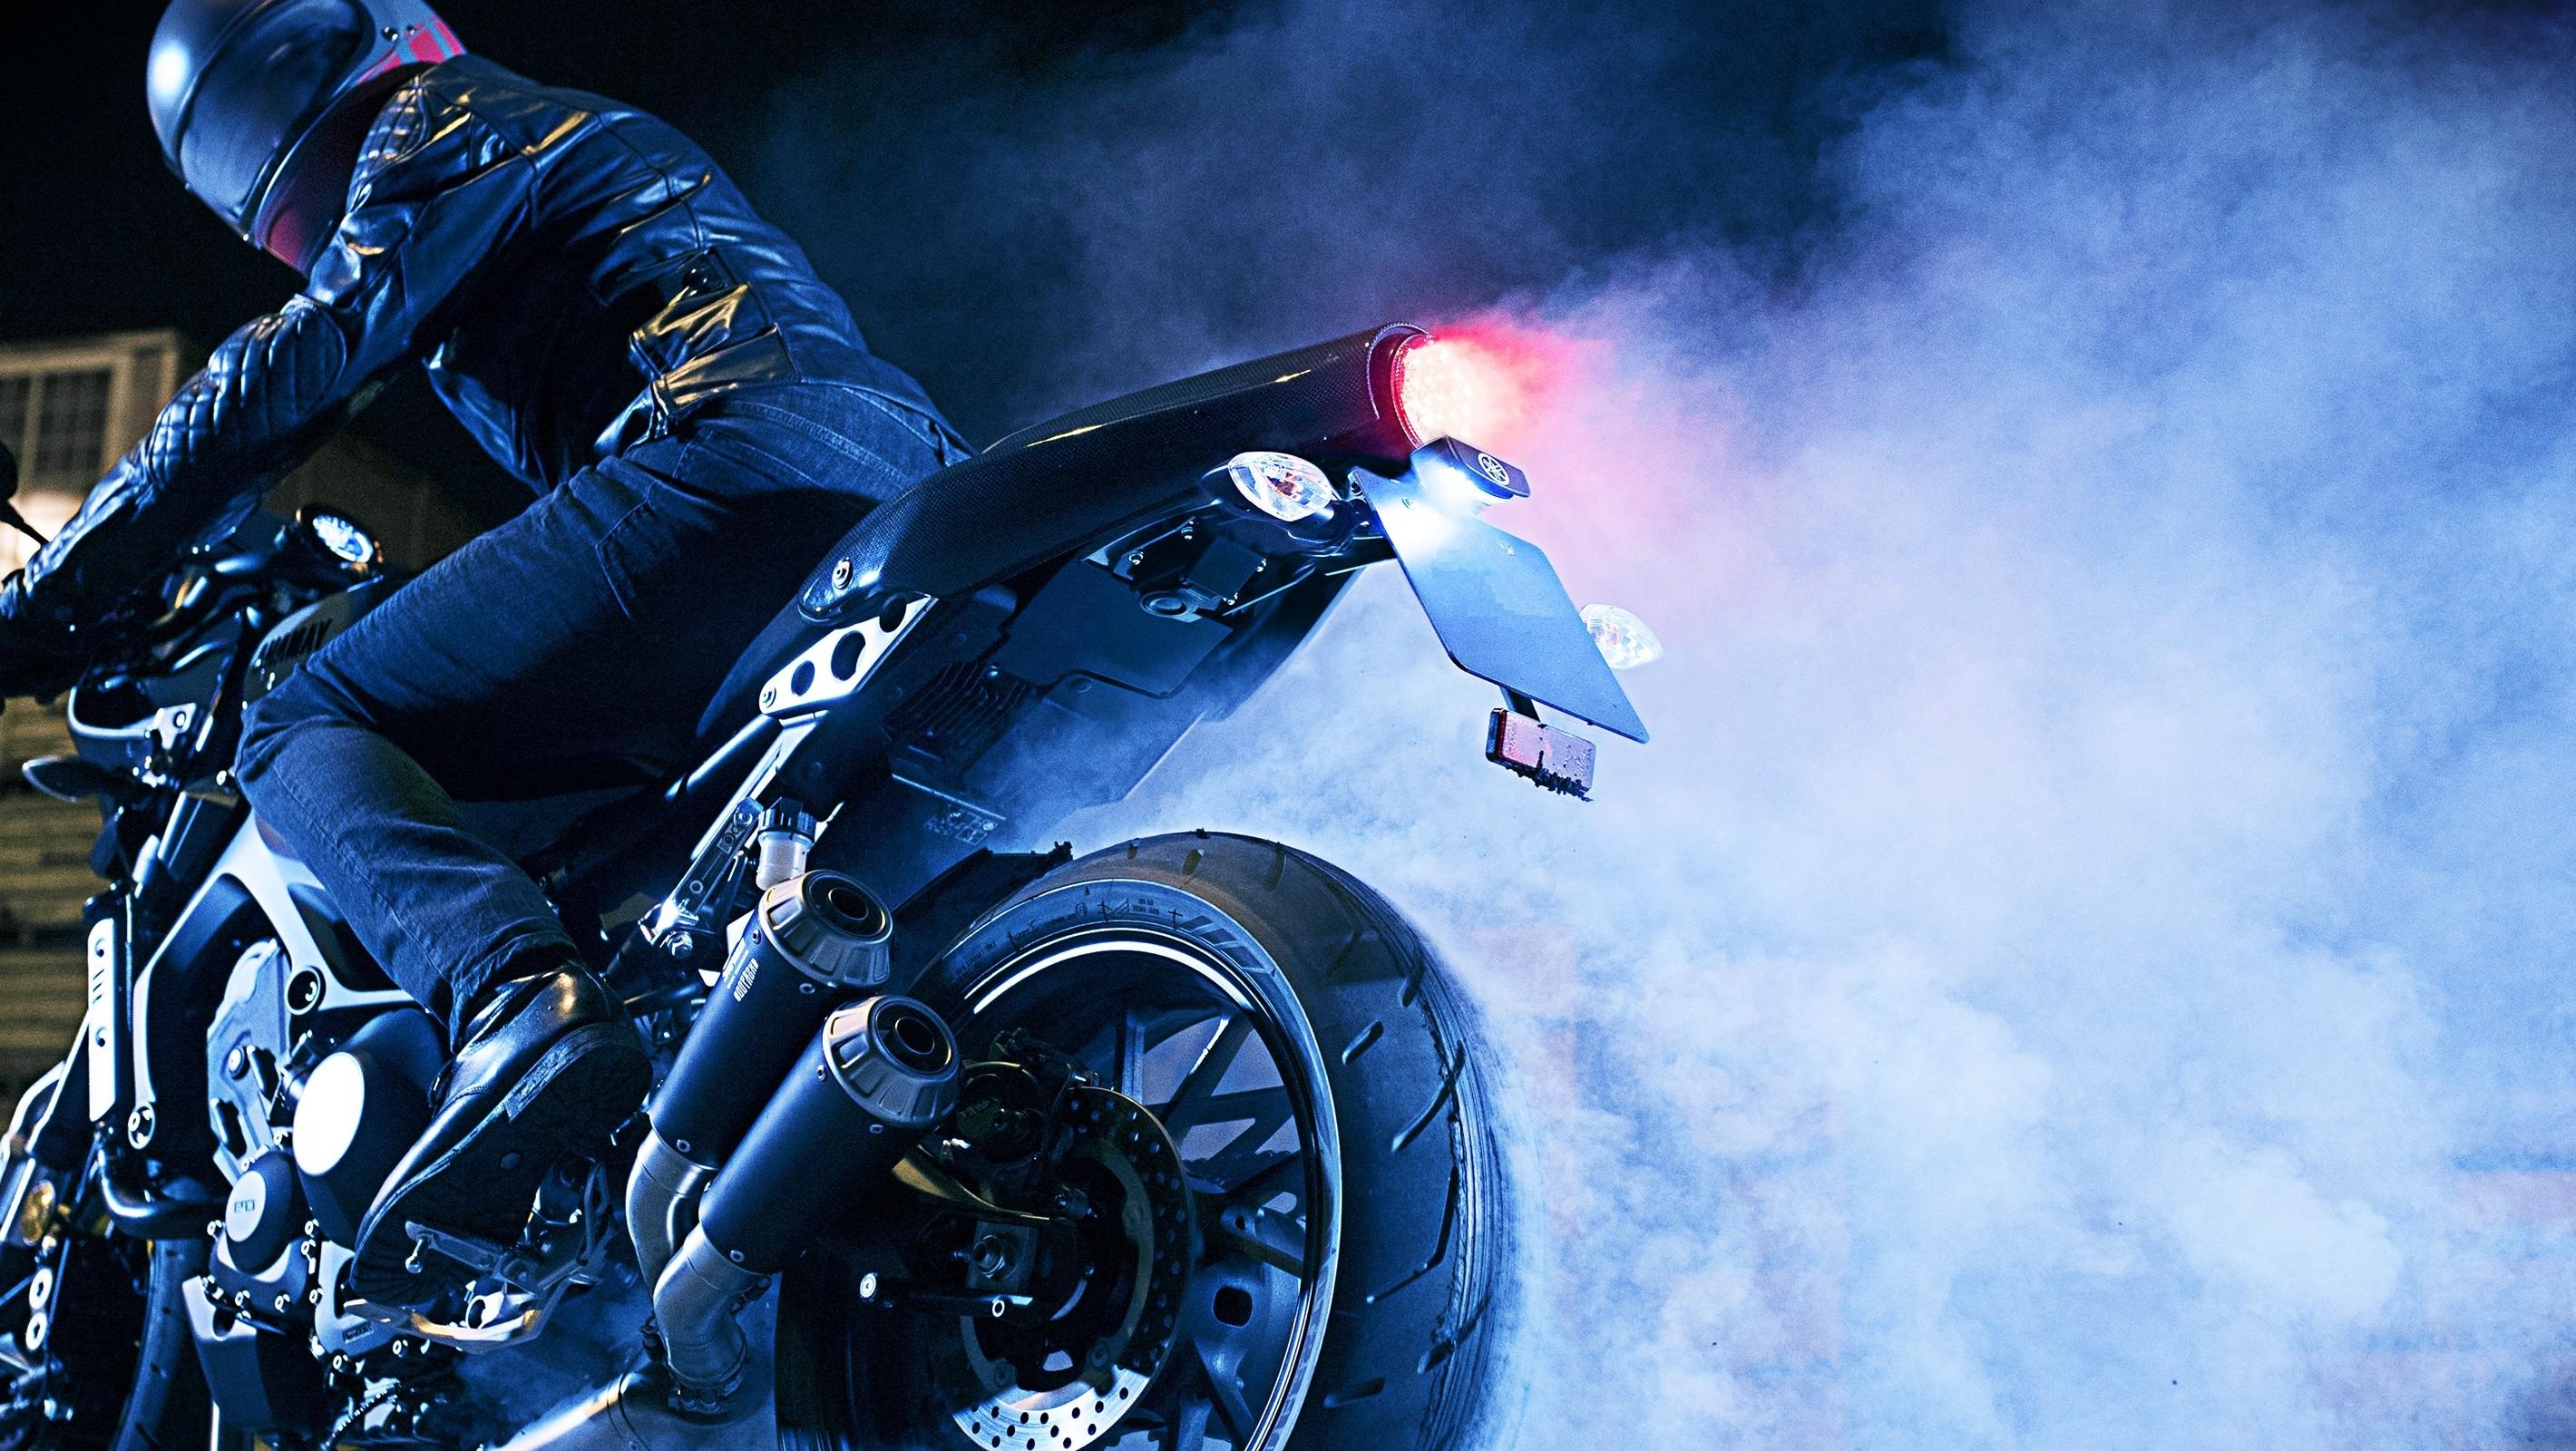 Yamaha XSR 900 Abarth | MotorCentrumWest